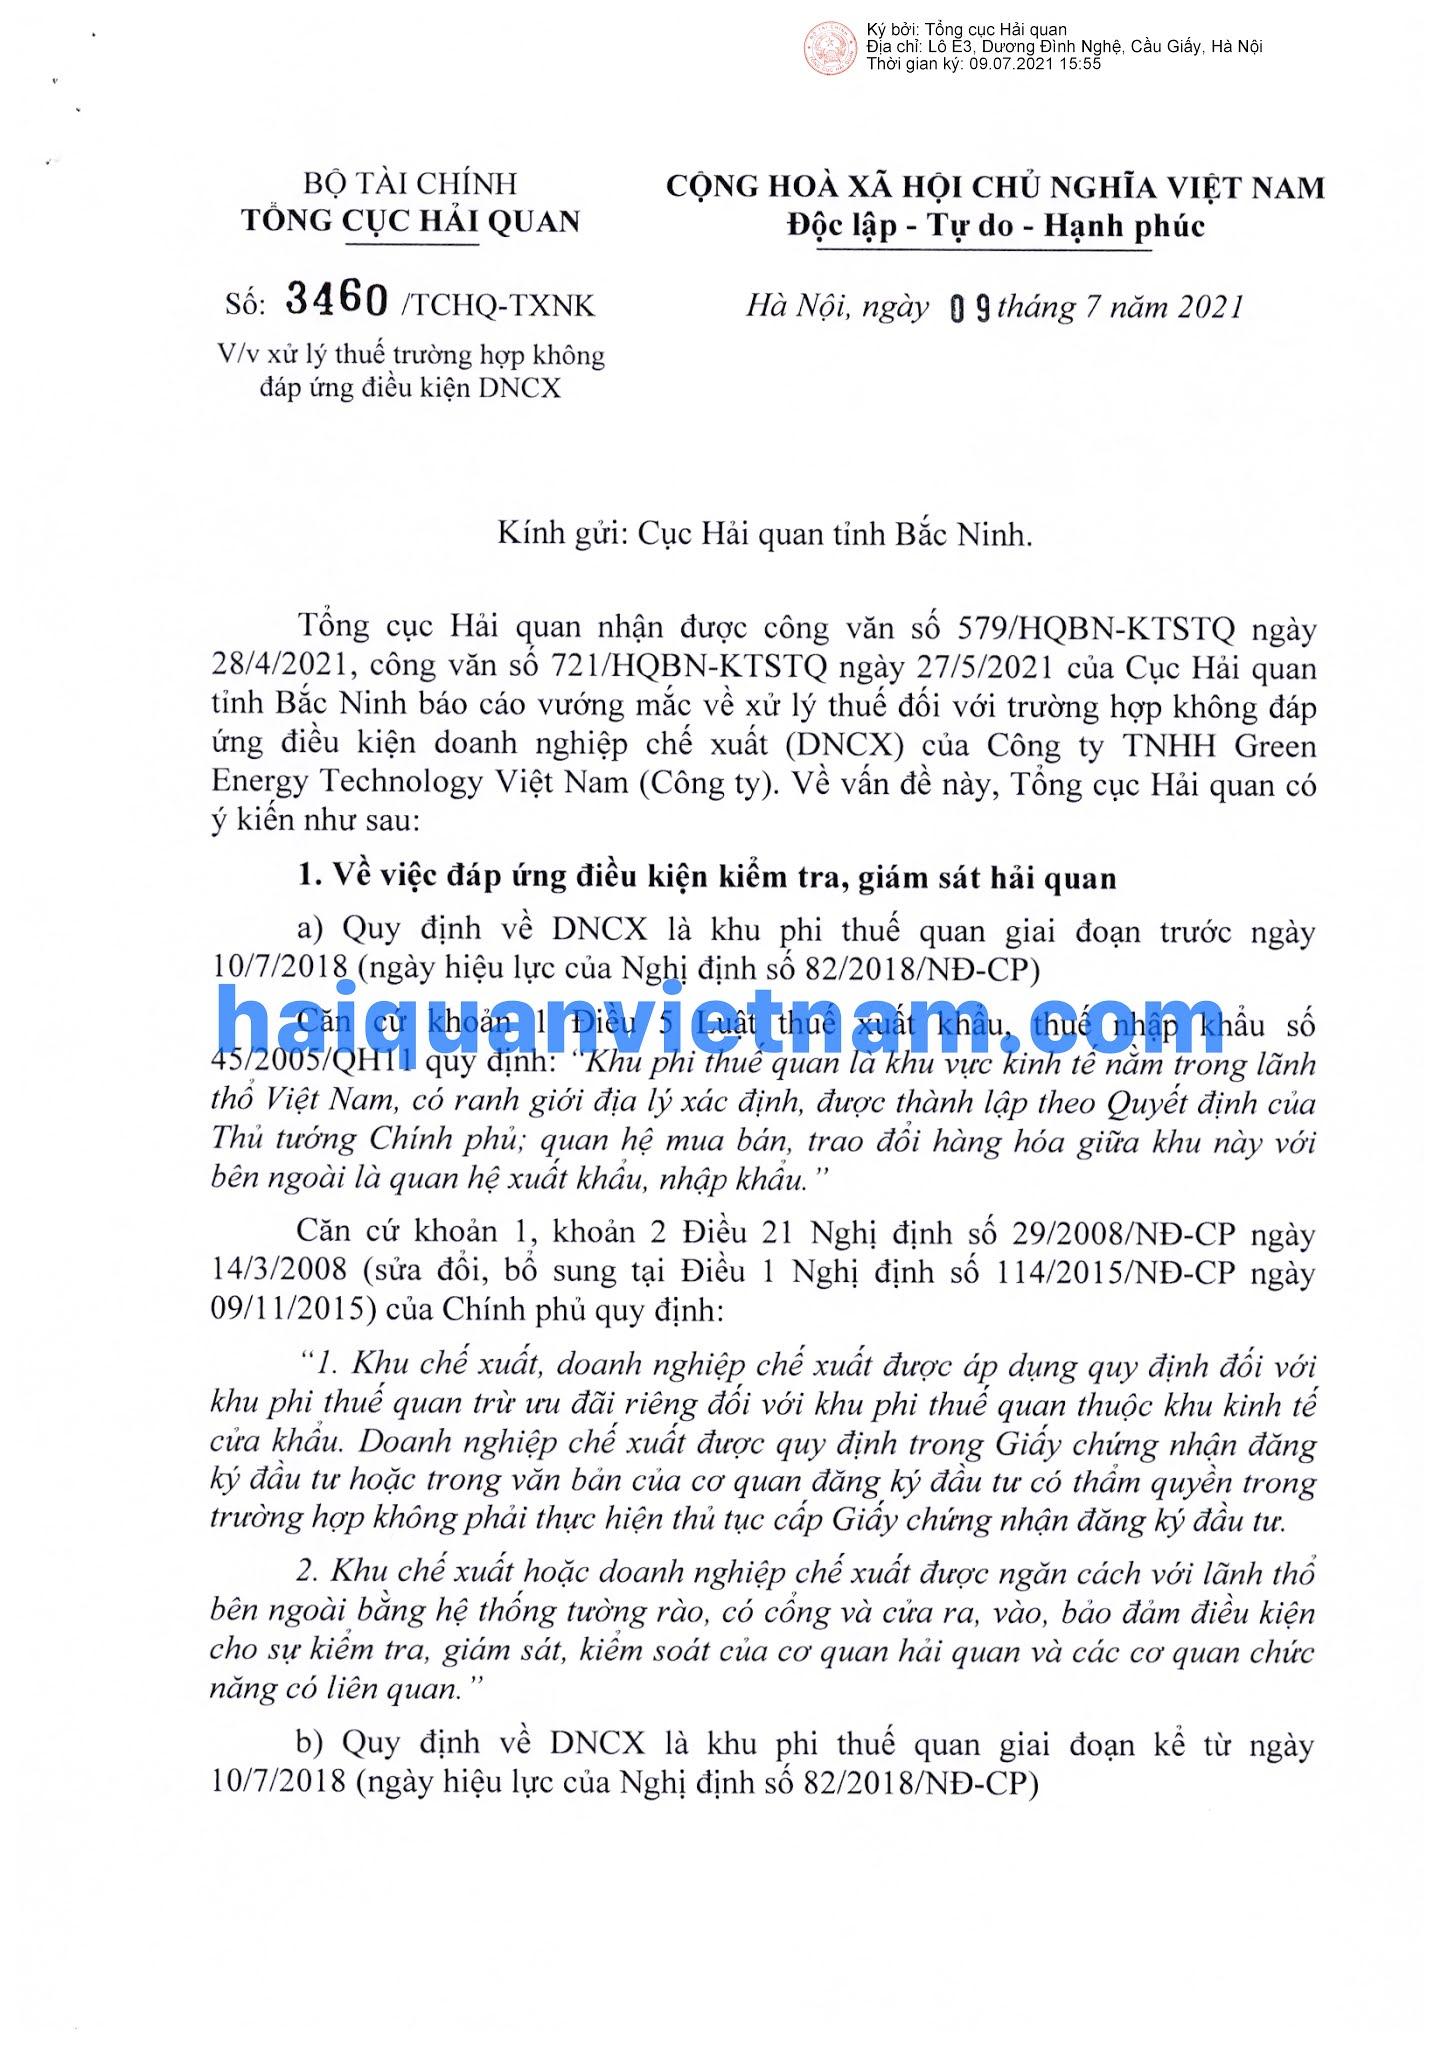 [Image: 210709-3460-TCHQ-TXNK_haiquanvietnam_01.jpg]